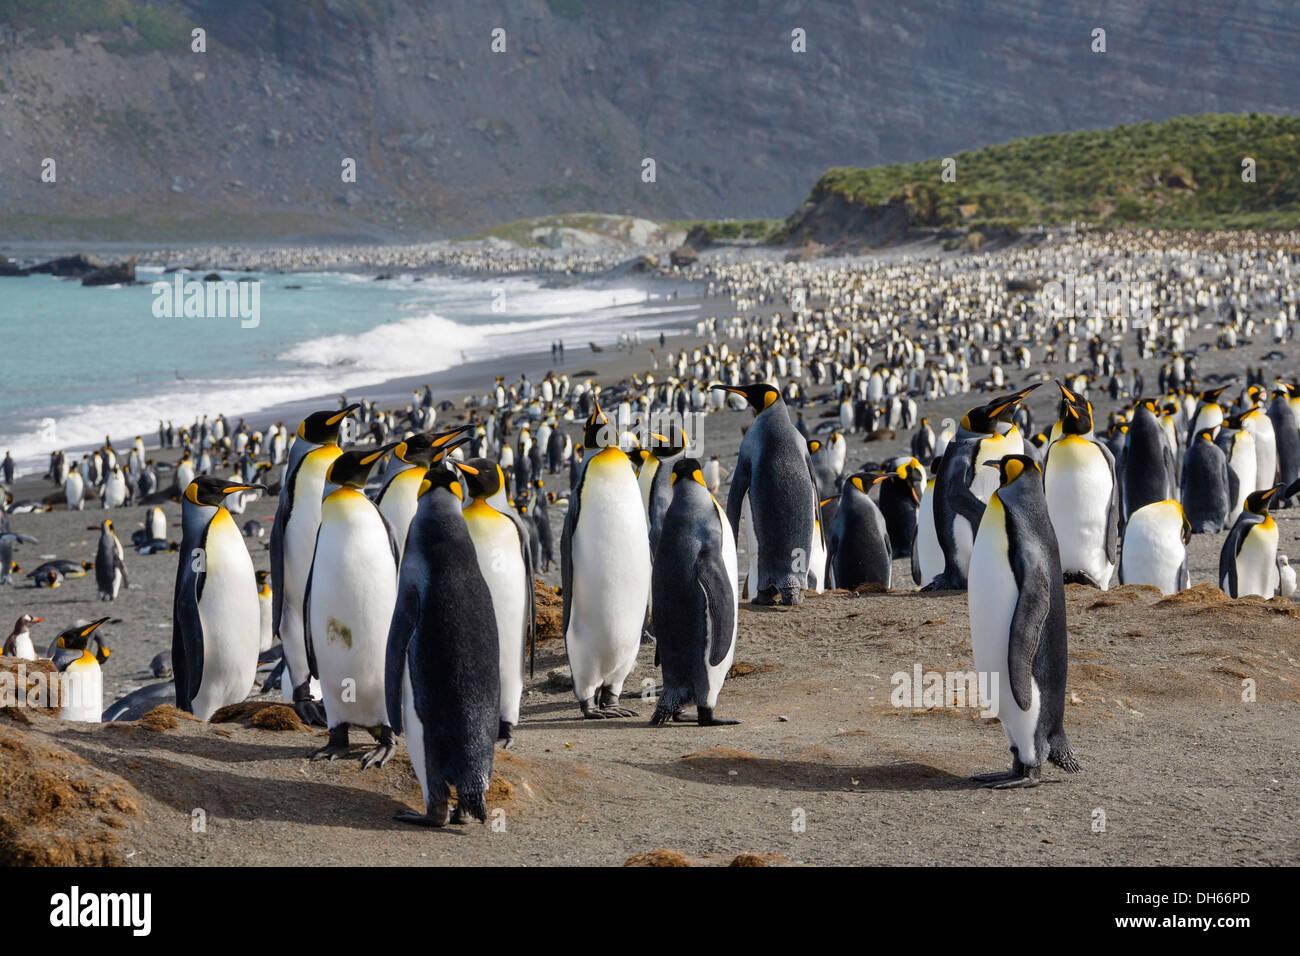 Breeding colony of King Penguins (Aptenodytes patagonicus), Gold Harbour, South Georgia, Subantarctic, Antarctica - Stock Image